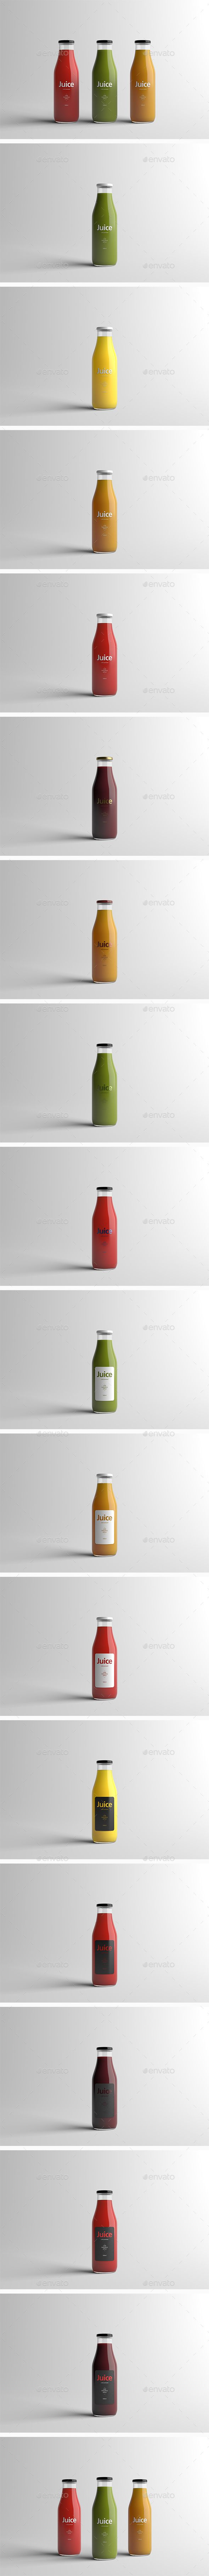 Juice Bottle Packaging Mock-Up. Download here: http://graphicriver.net/item/juice-bottle-packaging-mockup/15897481?ref=ksioks